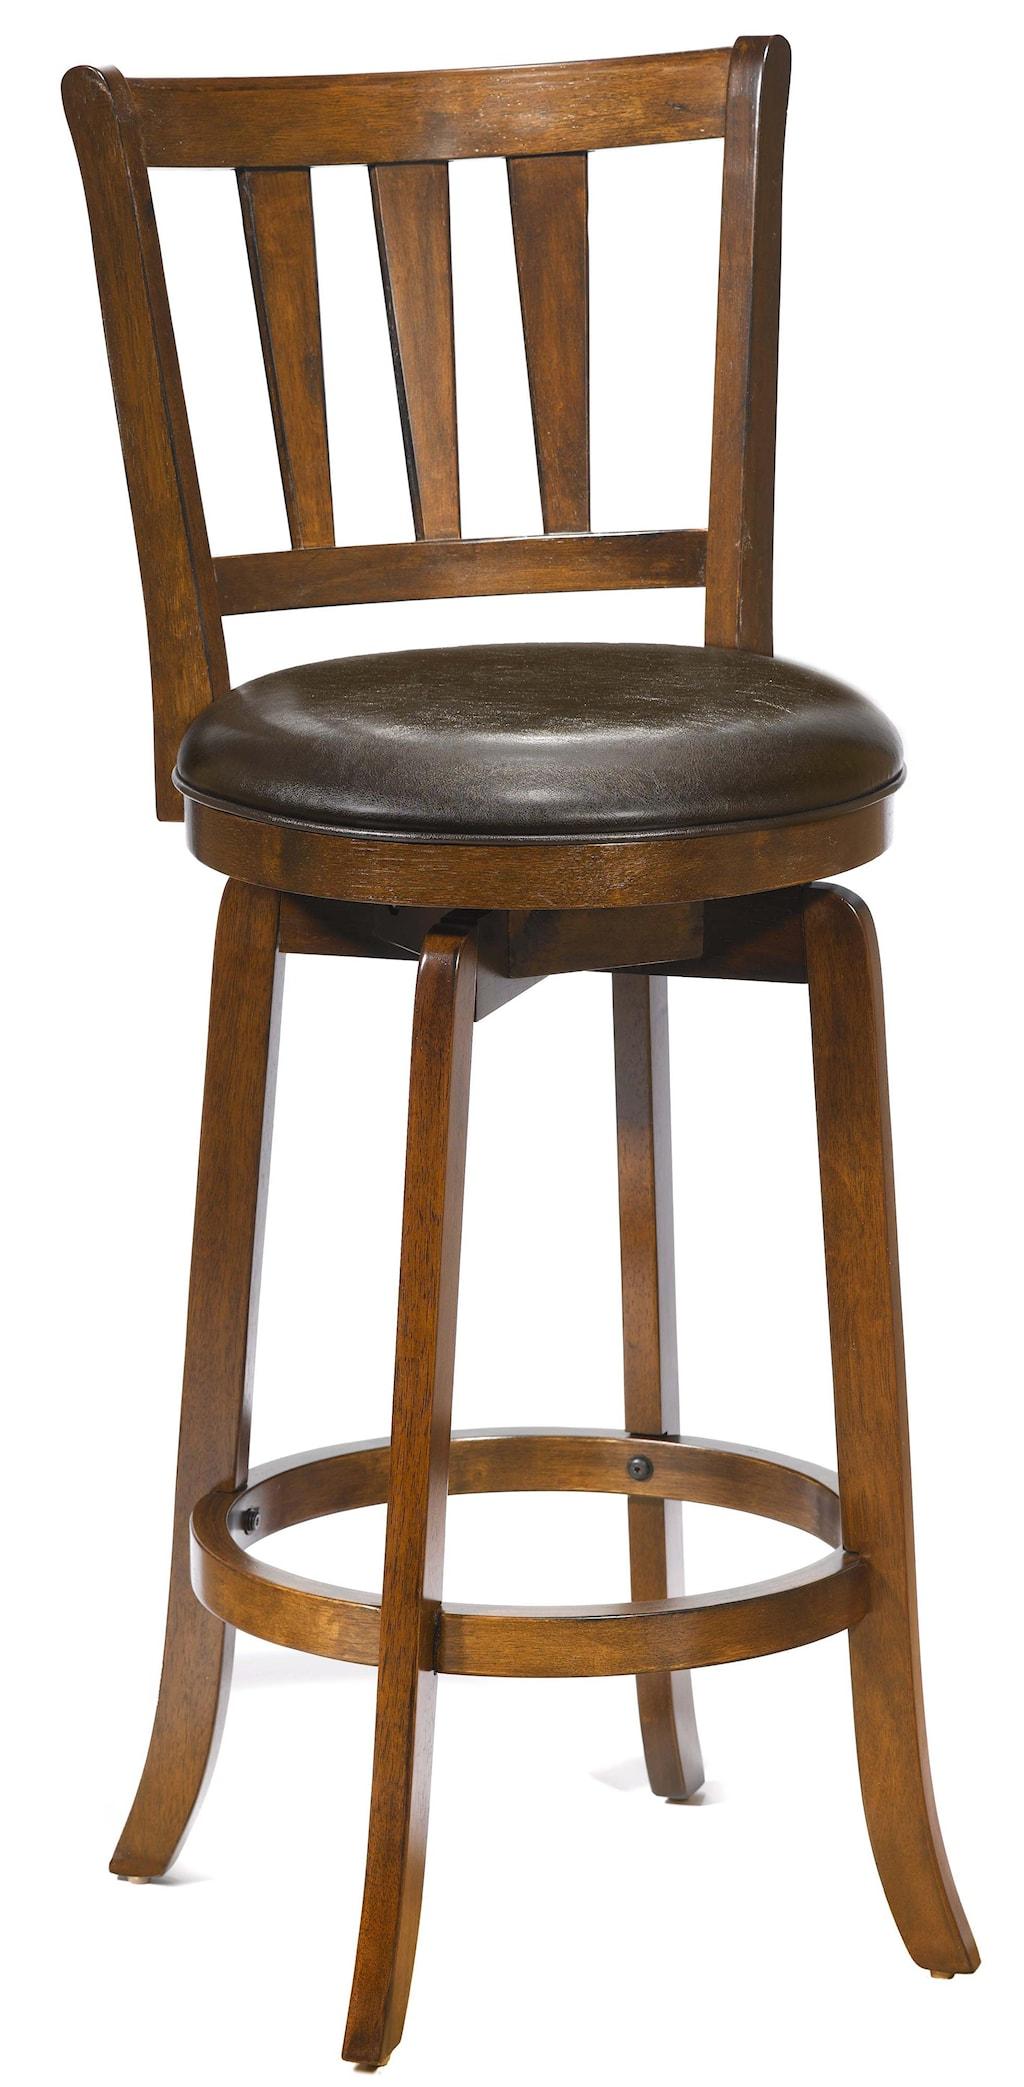 Hillsdale Wood Stools 26 Counter Height Presque Isle Swivel Bar